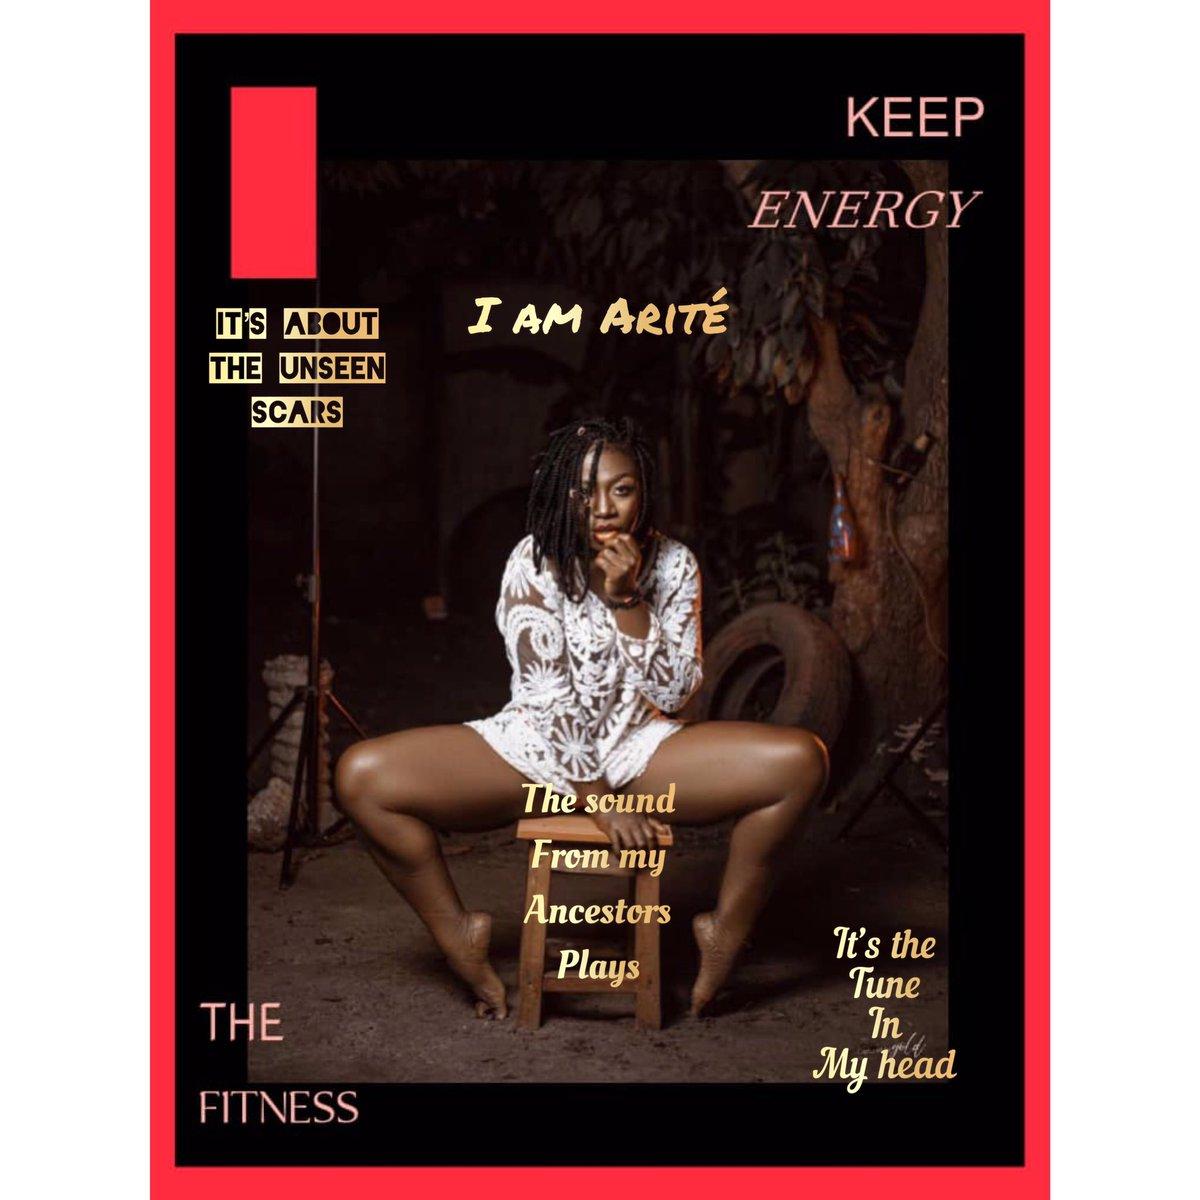 Watch:  I REP 040491!!!! #AmericanIdol #magazine @voguemagazine @BritishVogue @itaawmag @TIME @GenevieveMag @NYMag #blogger #bloggingcommunity #AdekunleGold #AskPCJ #aritemusic #3MusicAwards21 #365PortraitsOfSUHO #potrait #Burna #BBNaijaHighlights